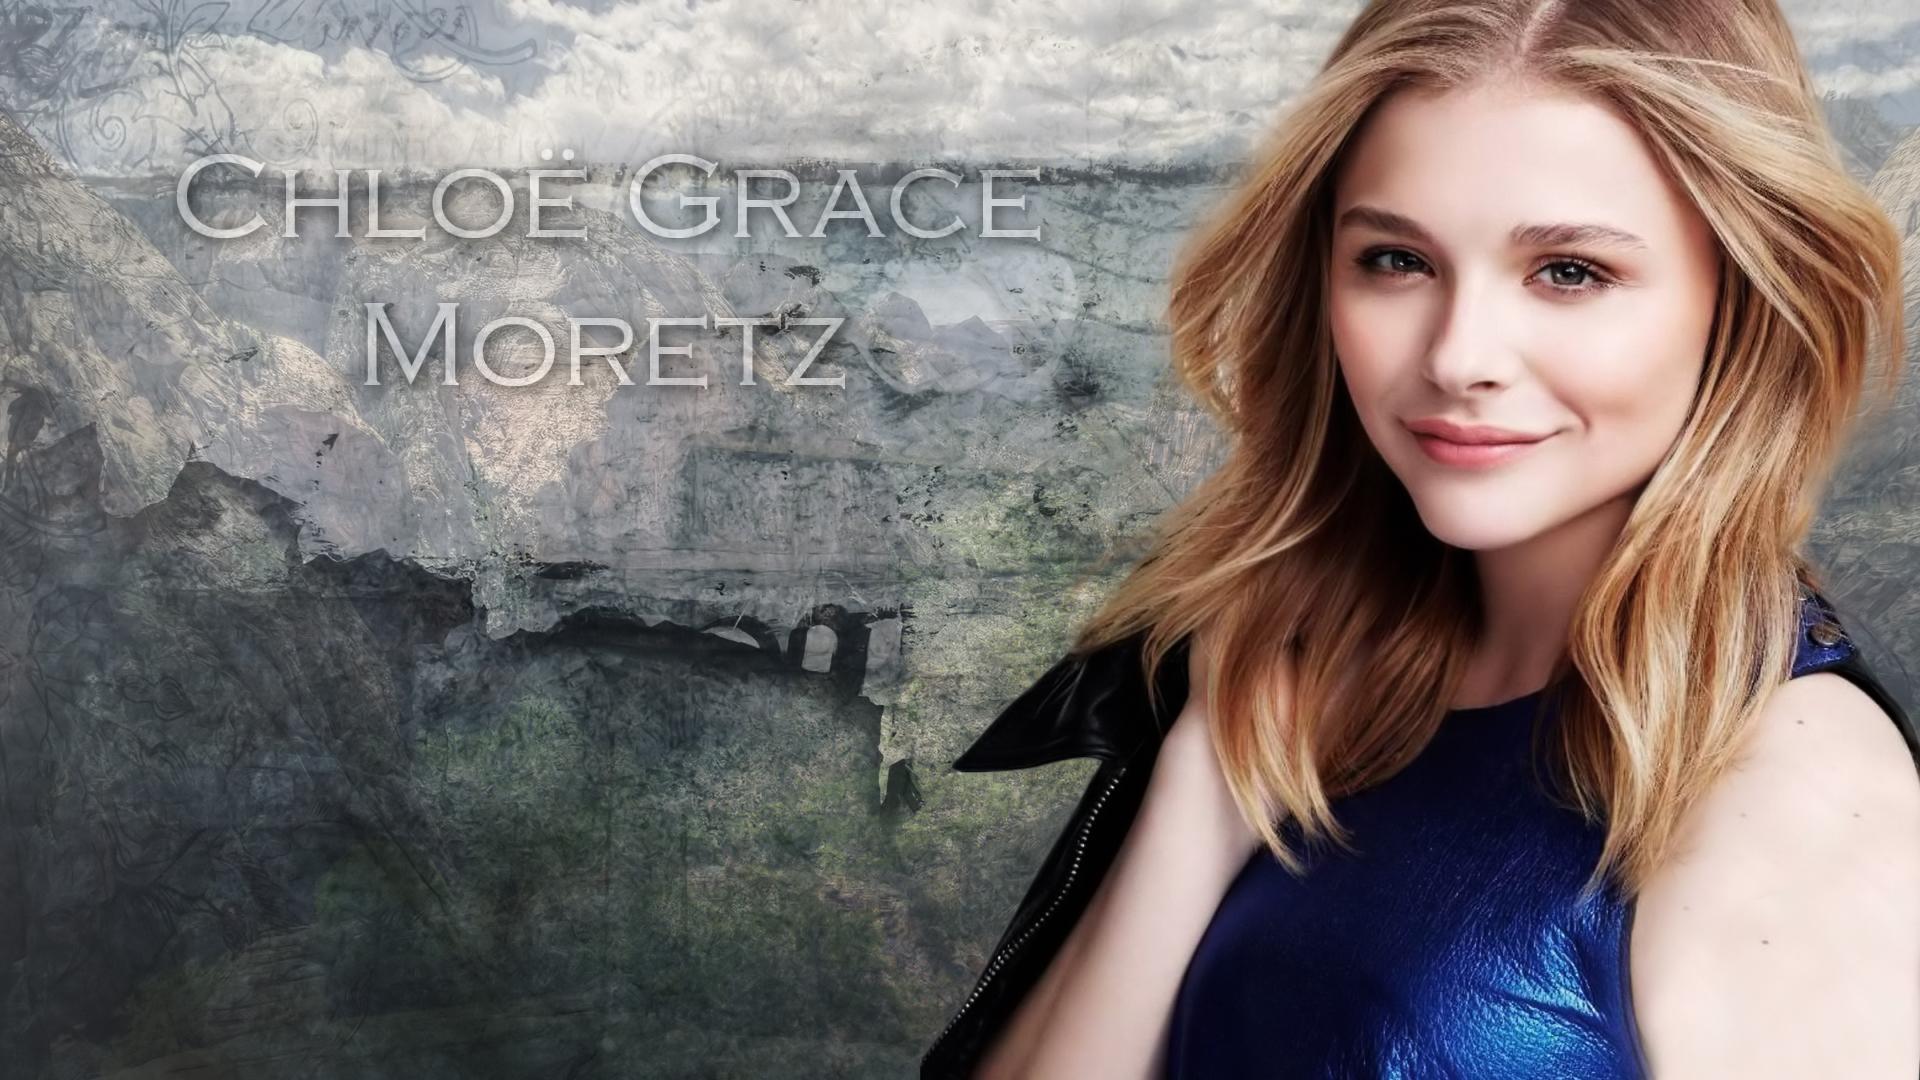 Chloe Moretz Desktop Wallpaper